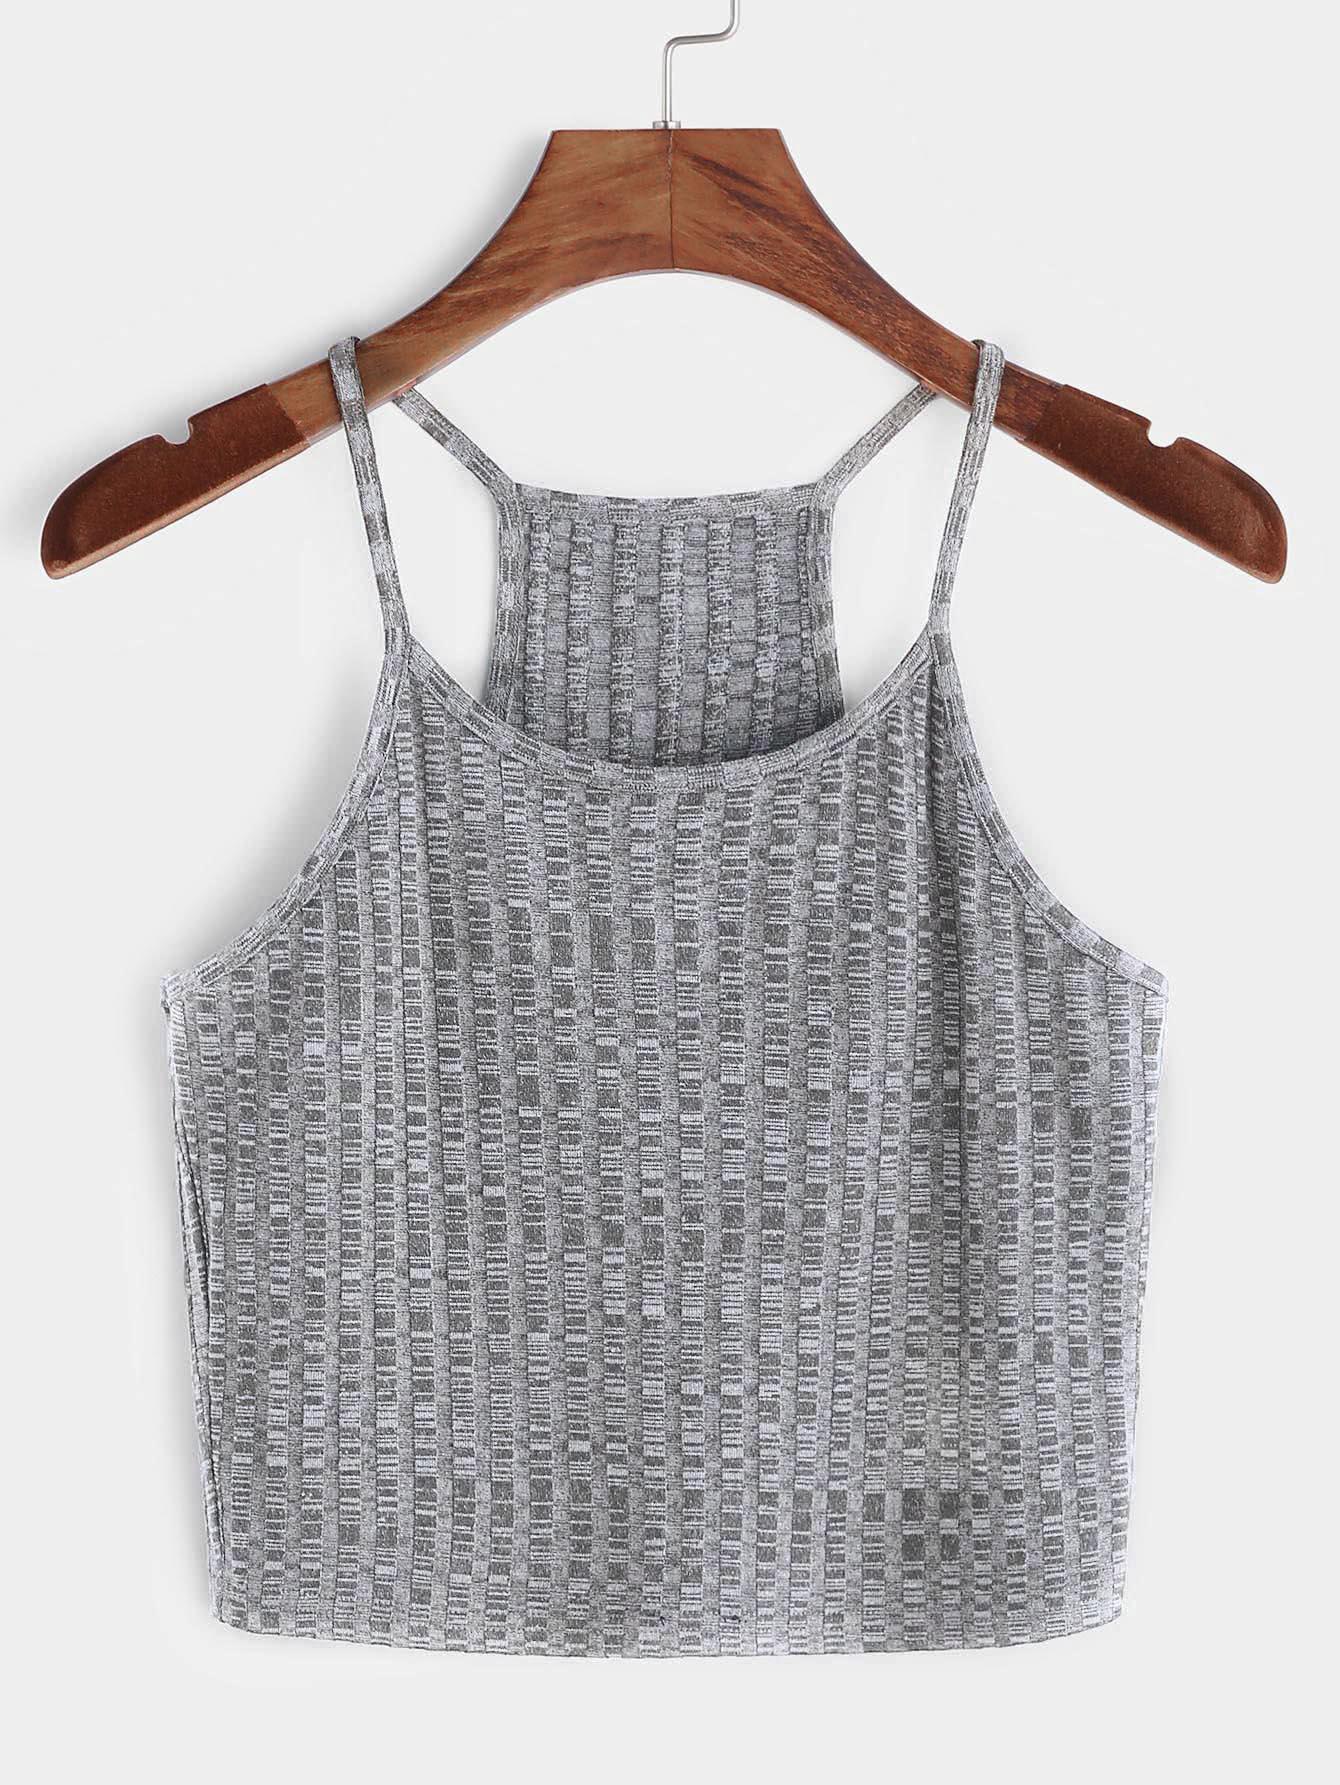 Heather Grey Ribbed Knit Racer Back Cami Top vest170310701